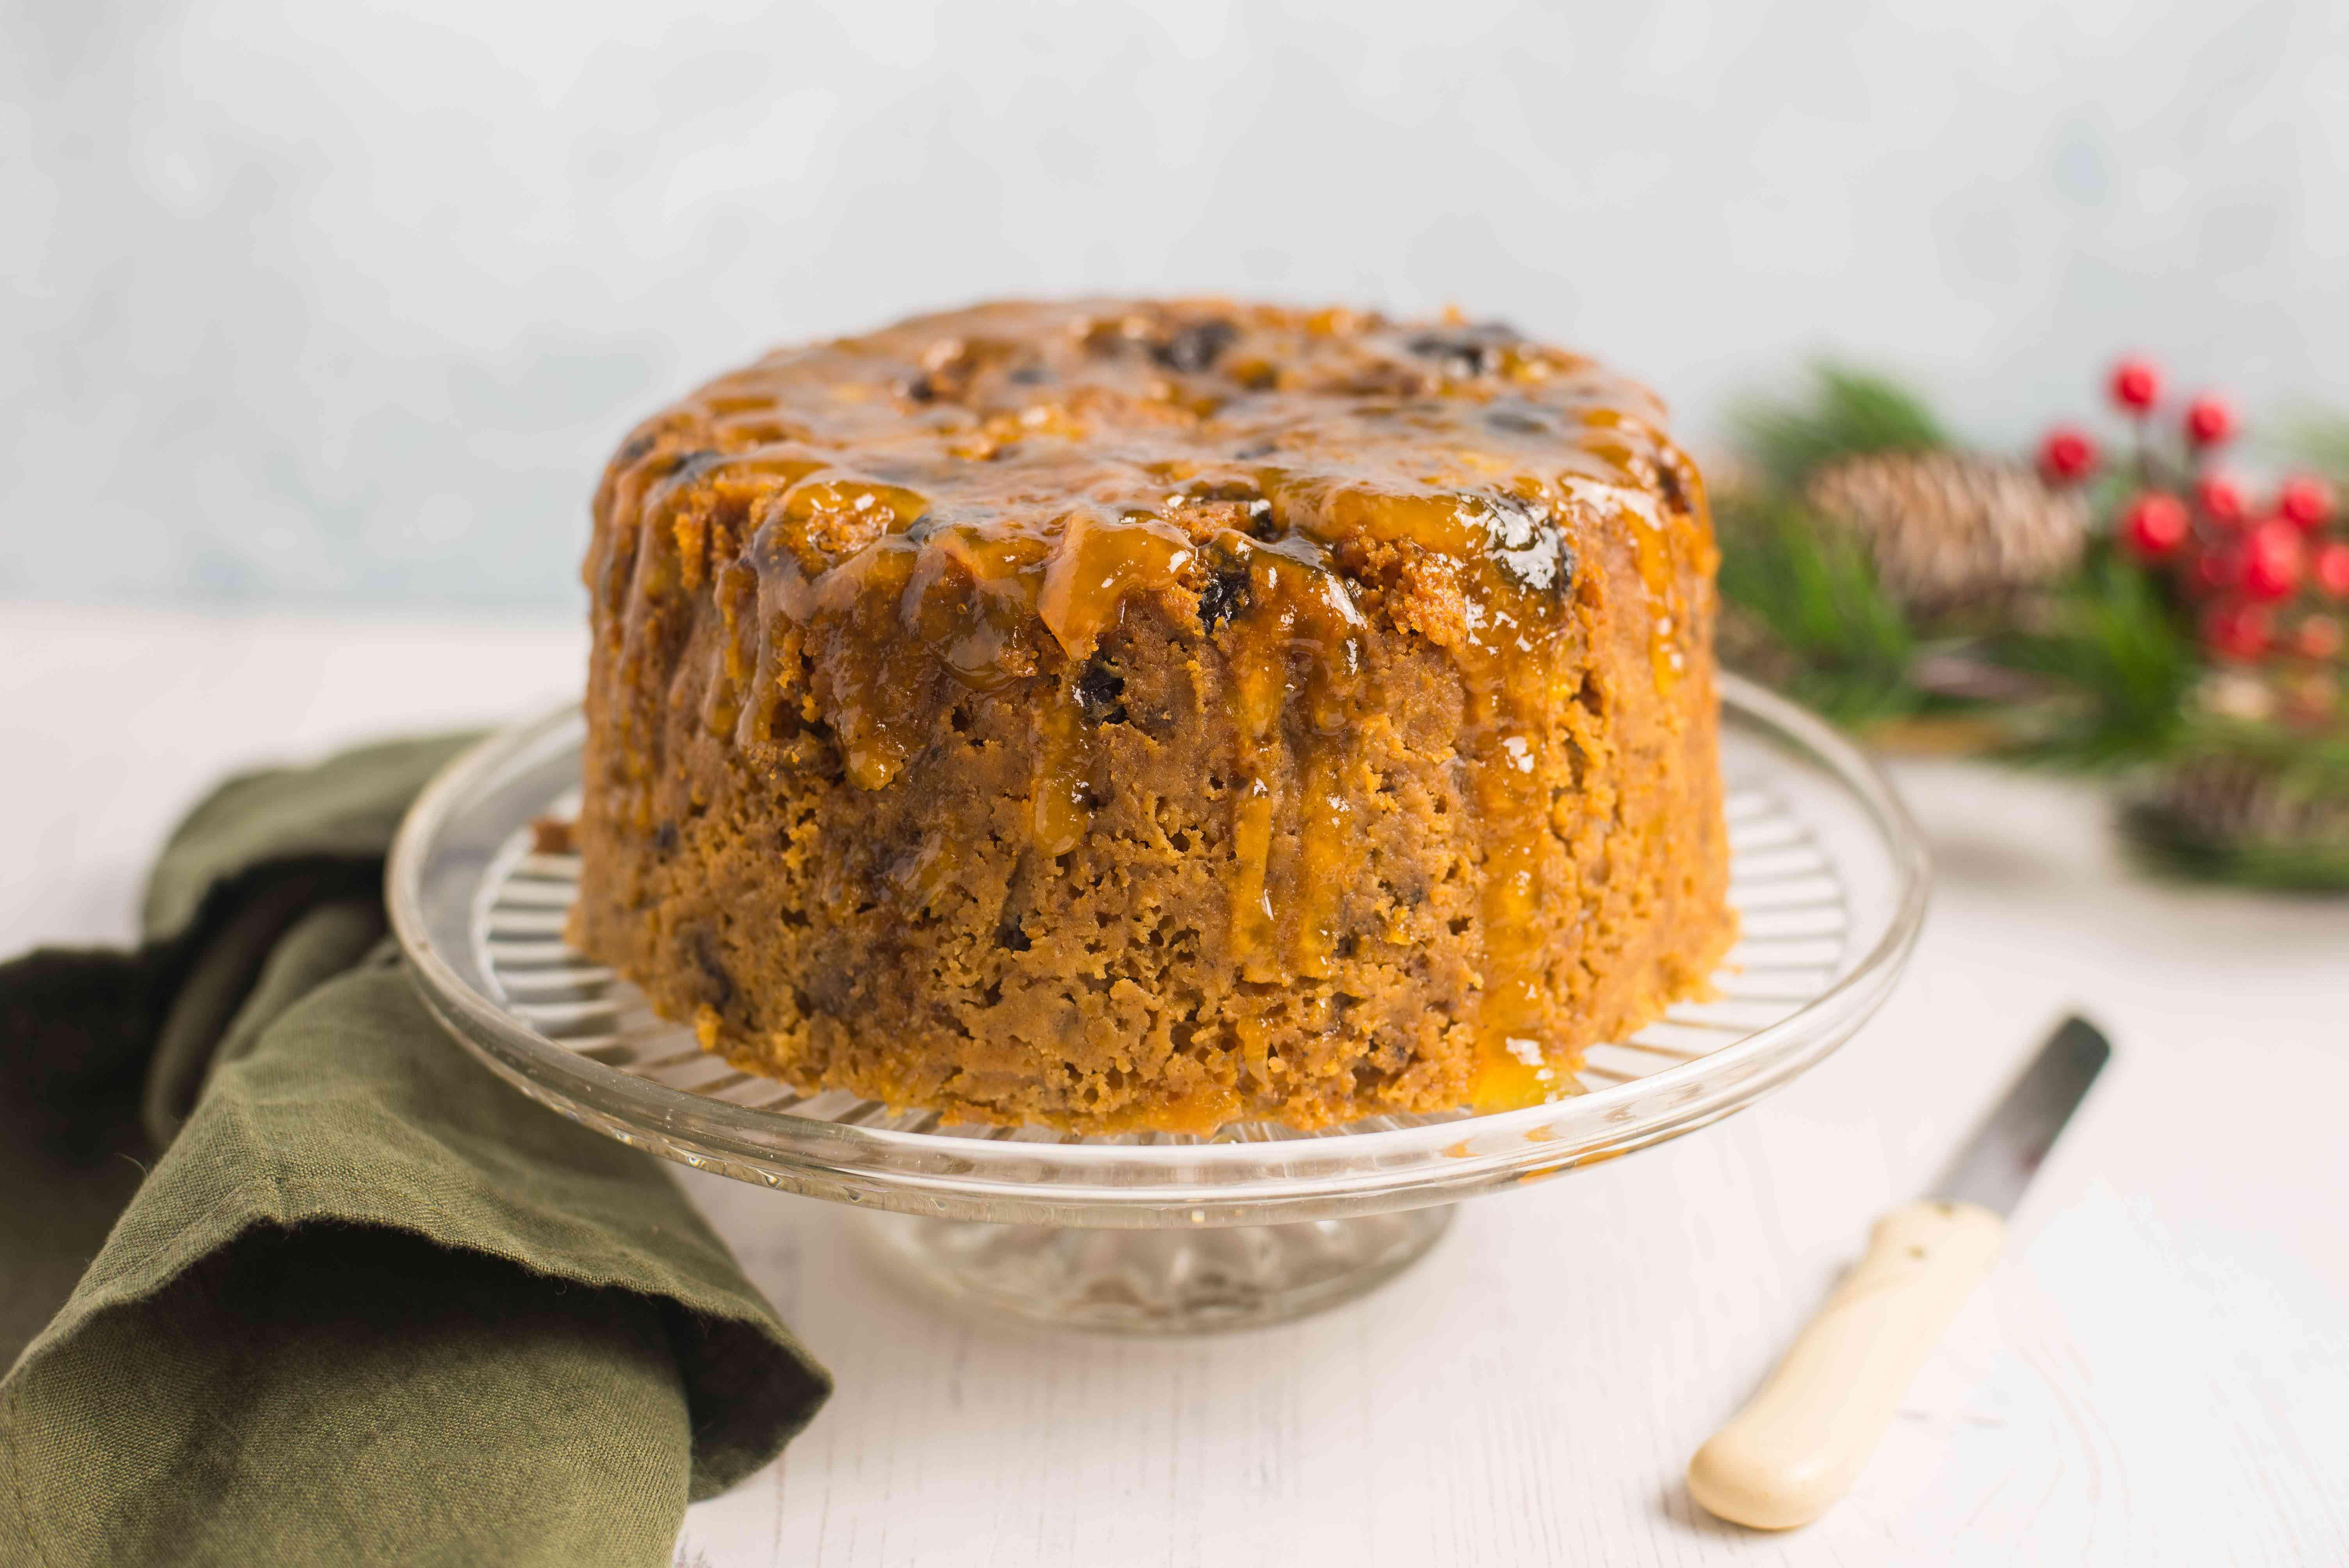 Crockpot steamed fruitcake recipe